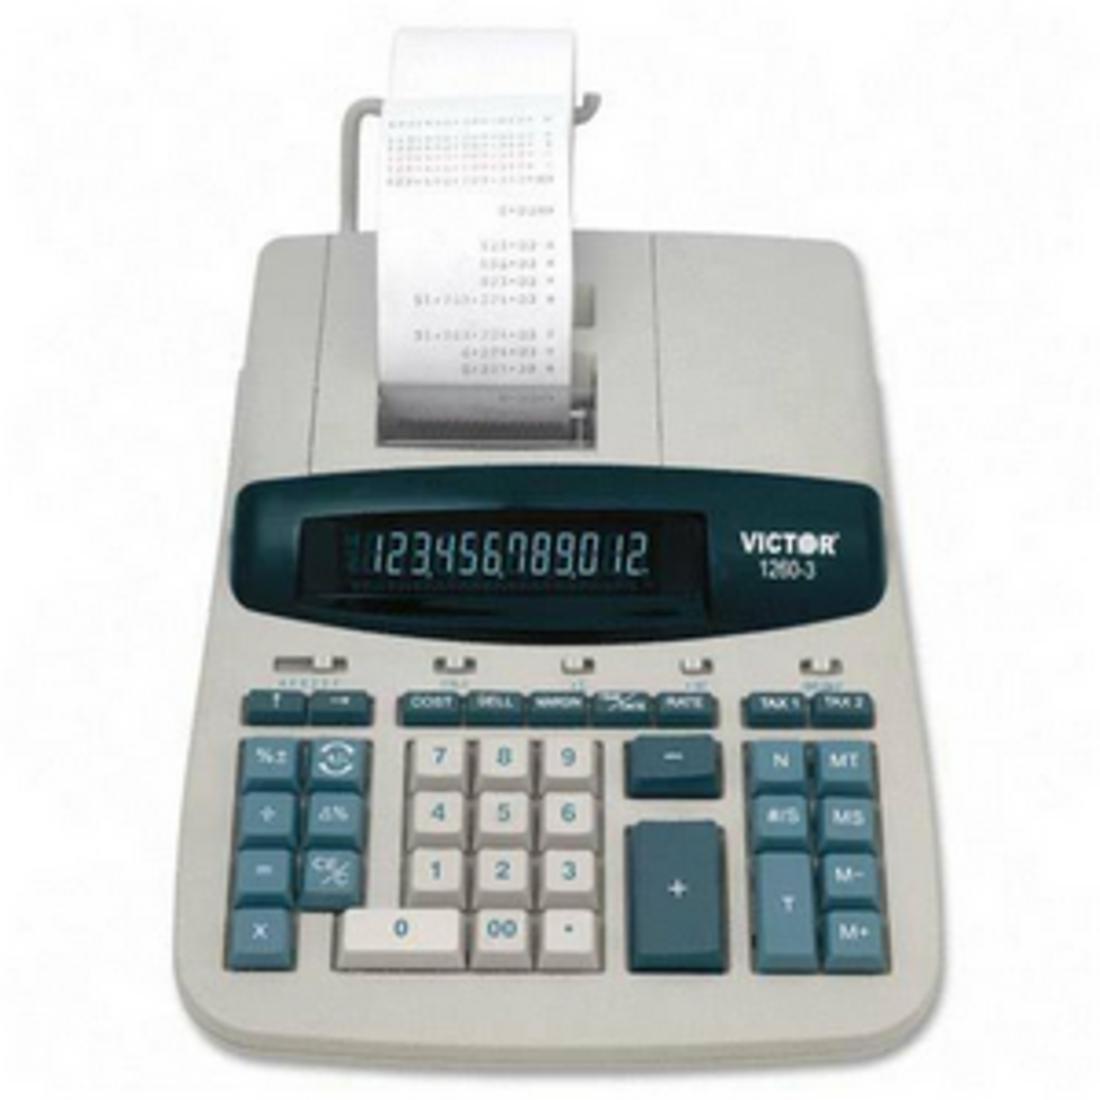 Victor 1260-2 Desktop Calculator, 12-Digit